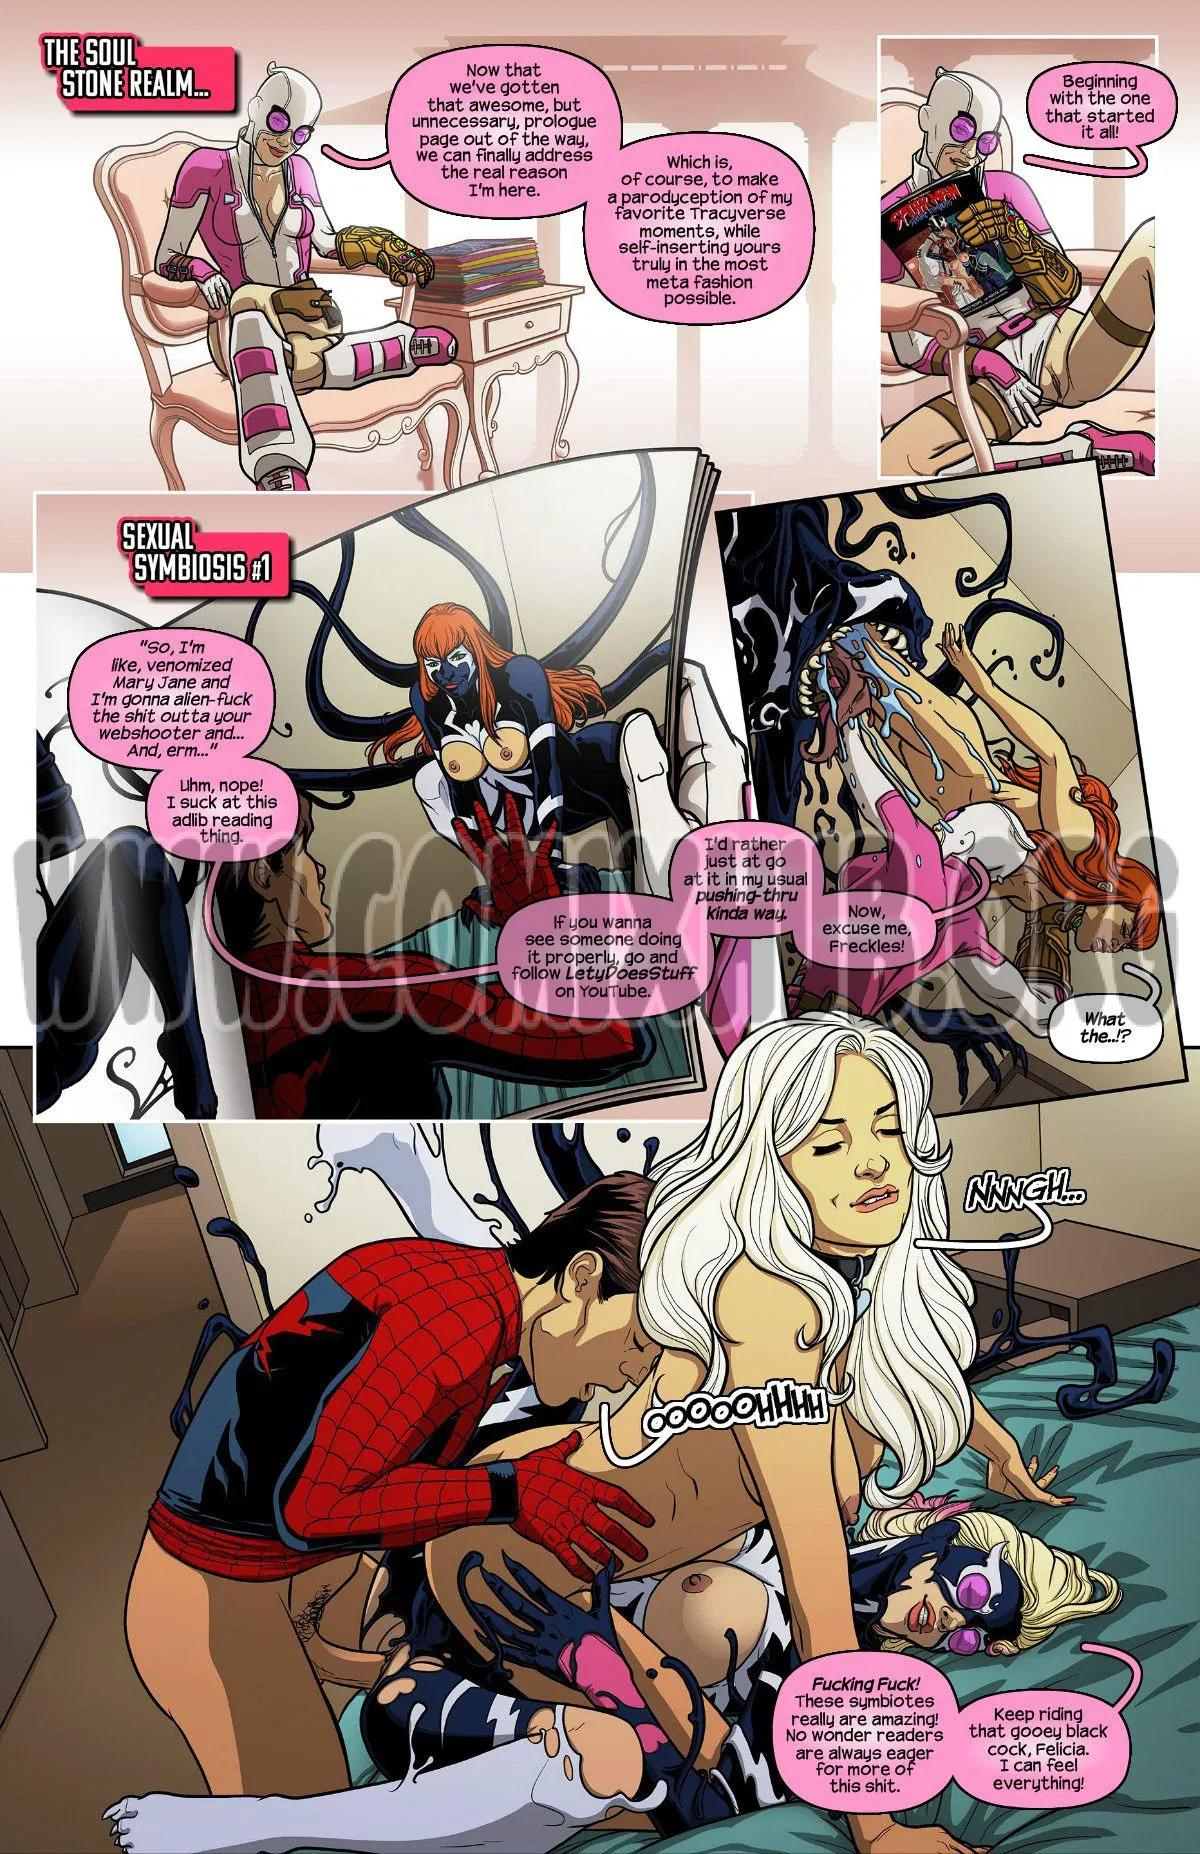 Gwenpool 100 porn comics Oral sex, Anal Sex, Blowjob, cunnilingus, Double Penetration, fingering, Gangbang, Masturbation, Straight, Threesome, X-Ray